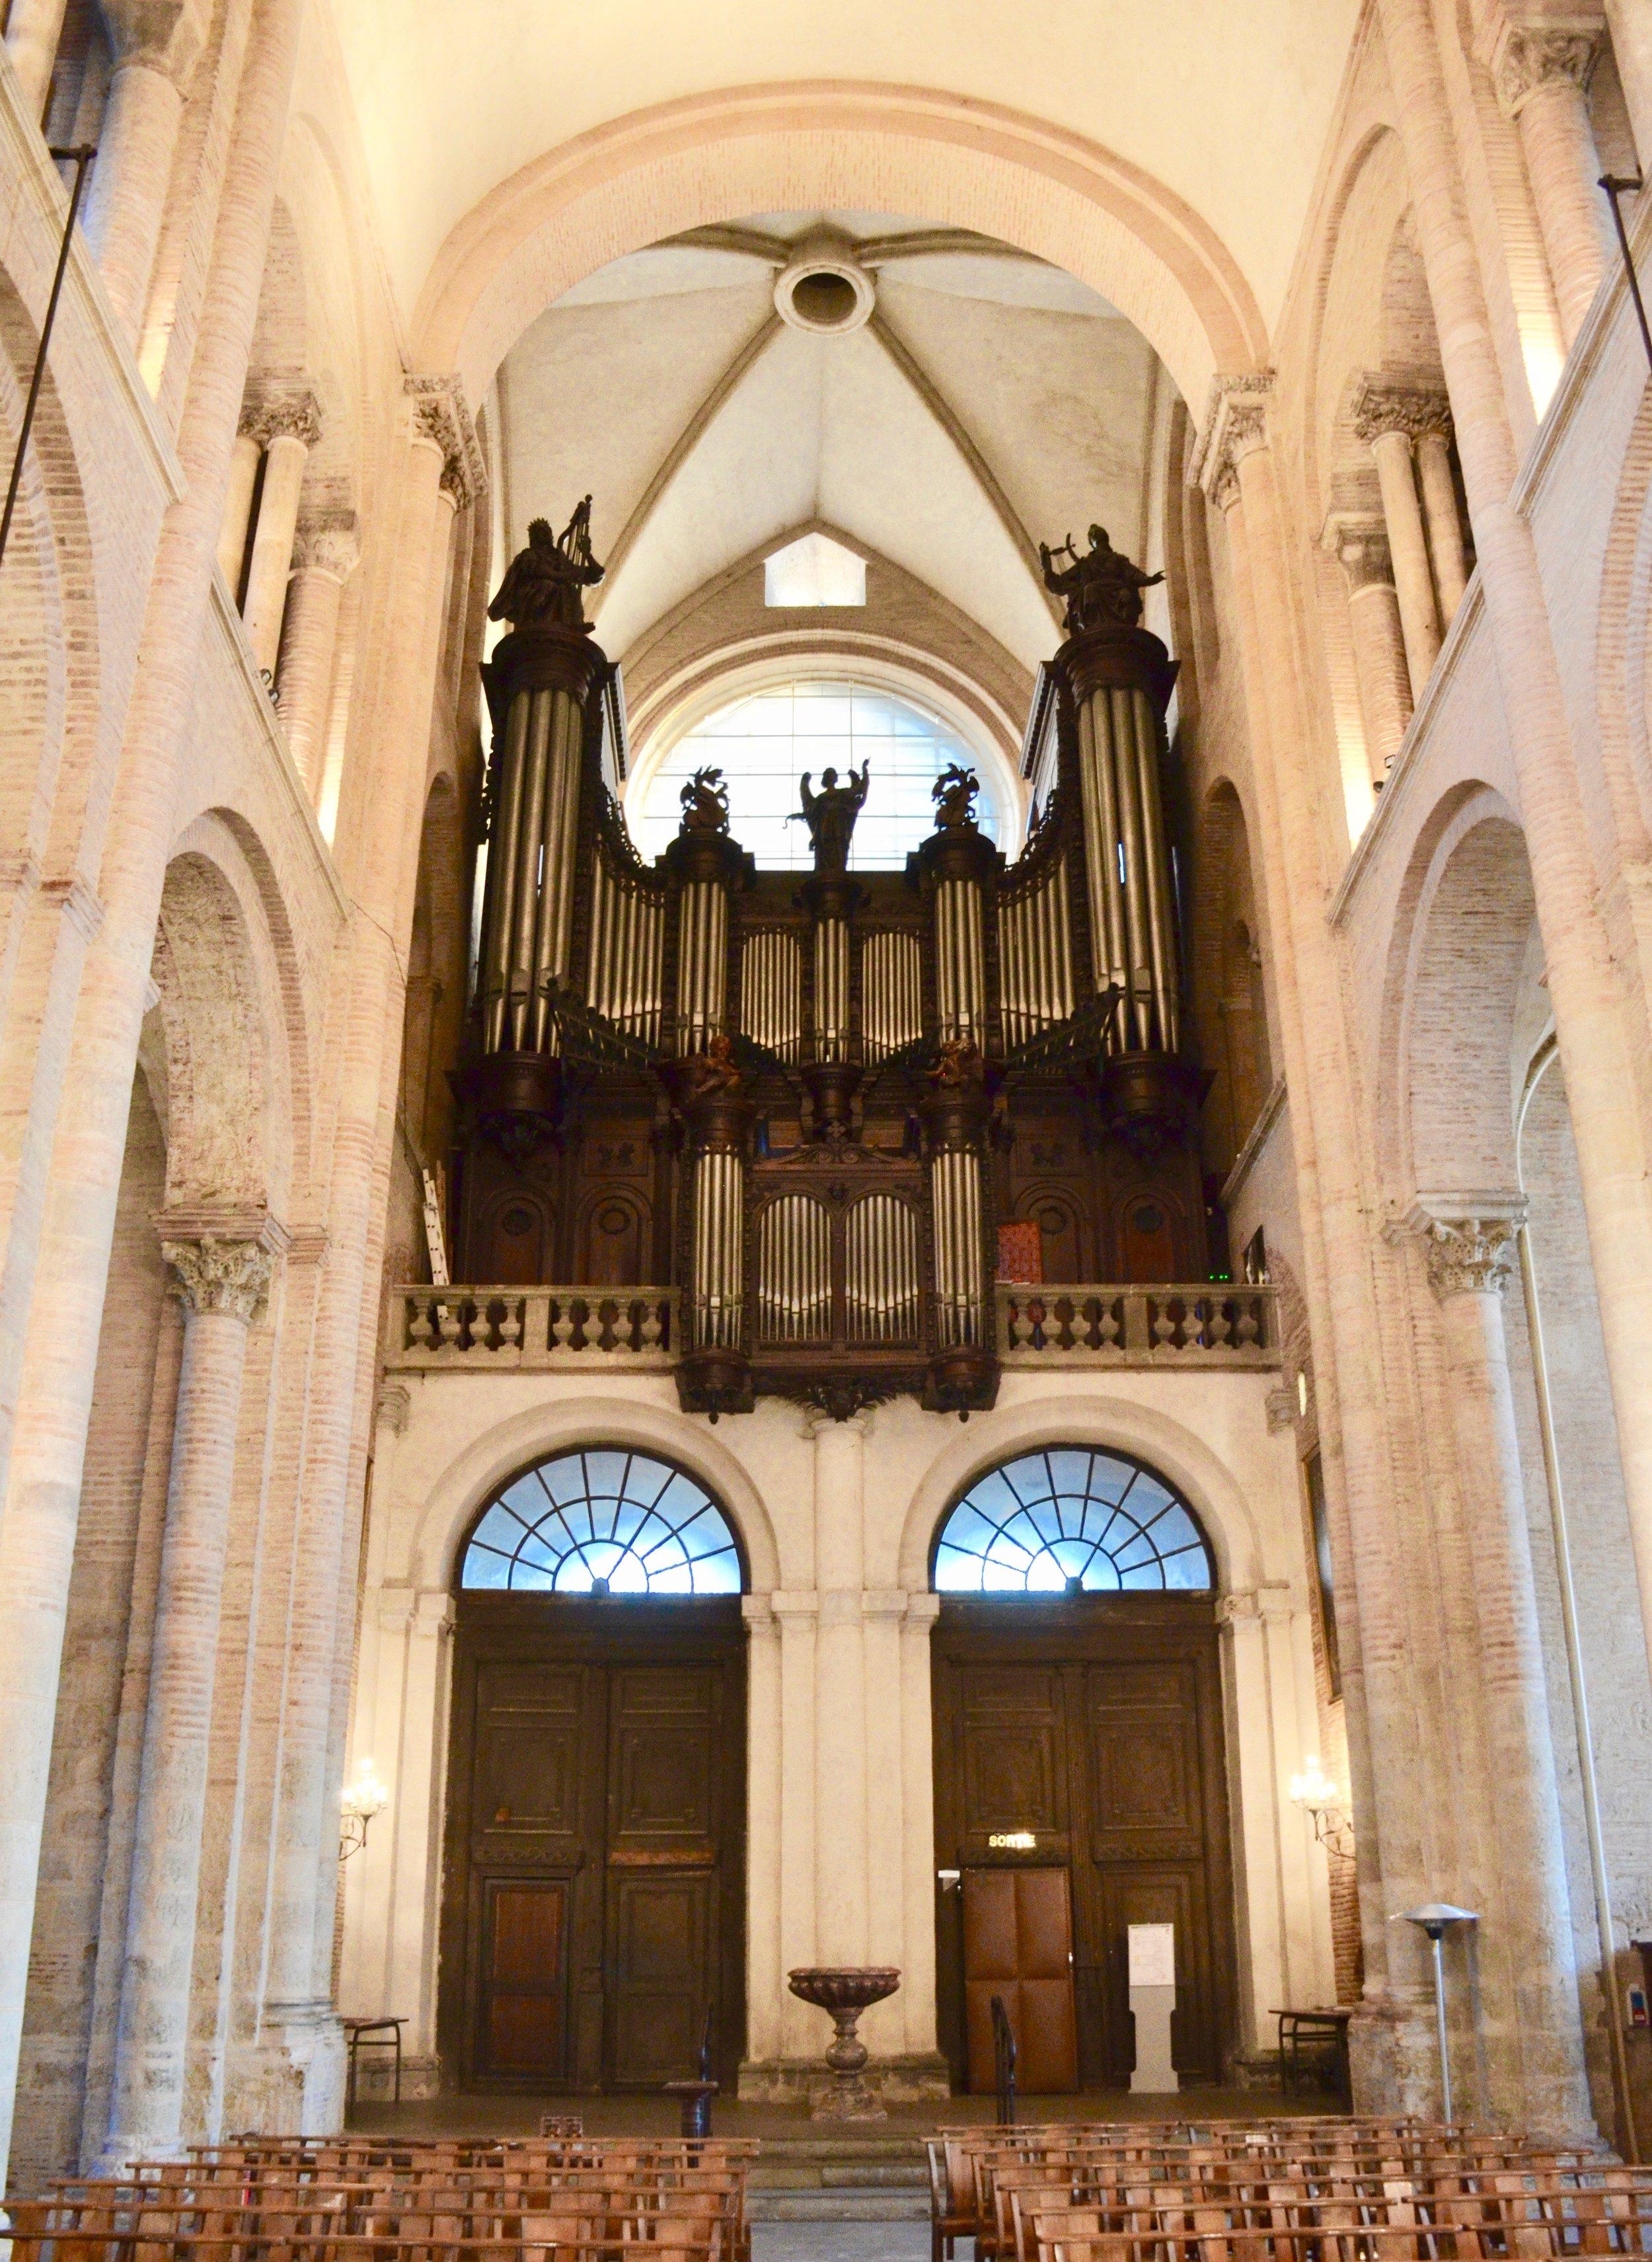 The Cavaillé-Coll organ in St-Sernin, Toulouse.